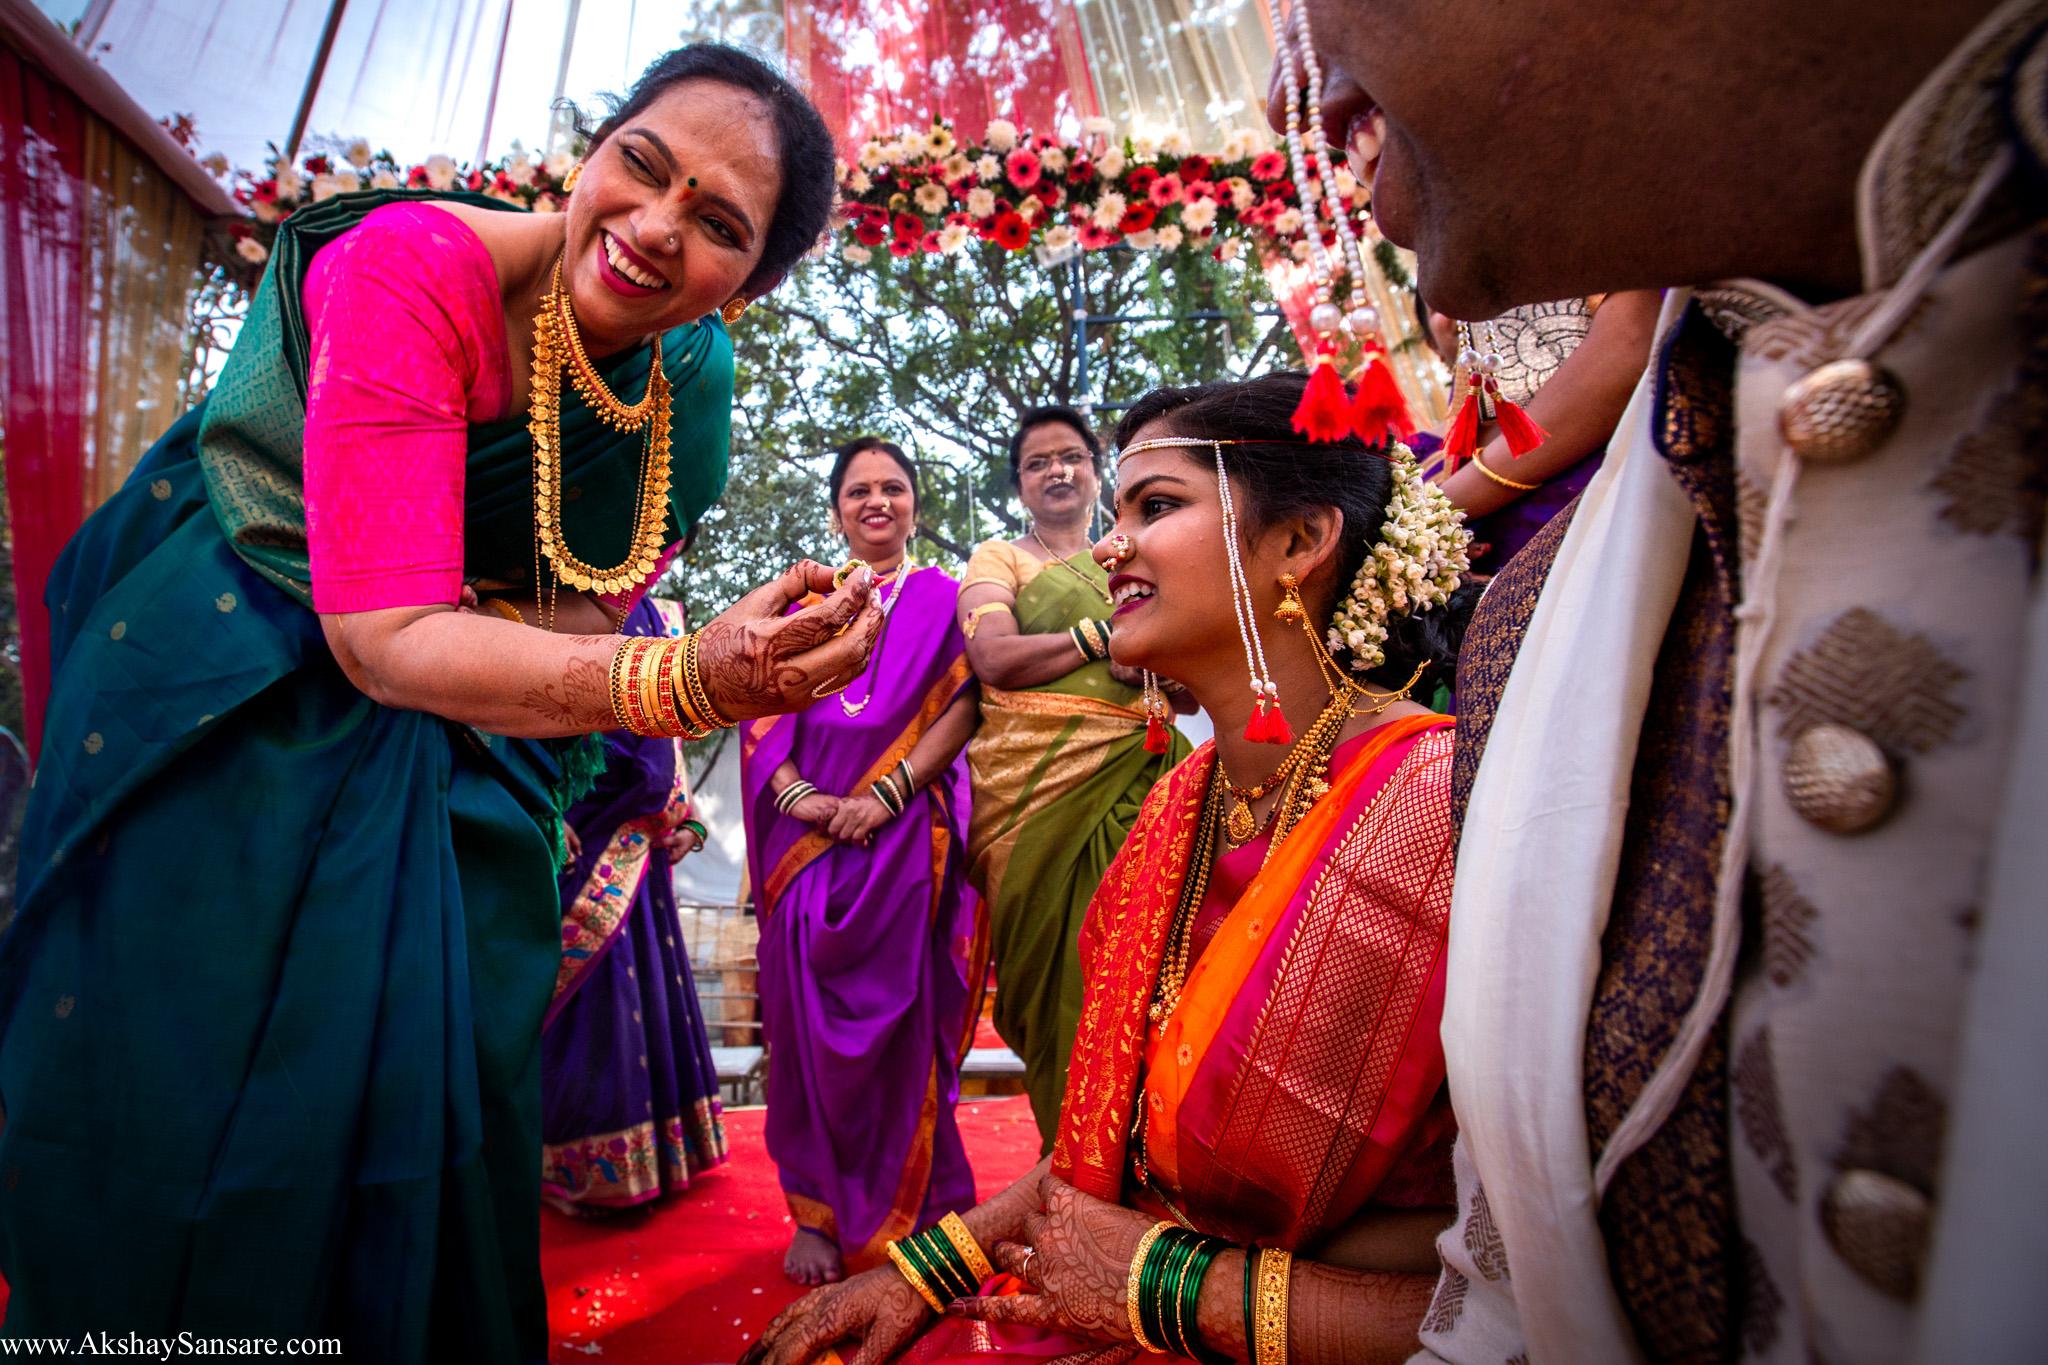 Salil x Kimaya Akshay Sansare Photography Candid wedding Photographer in mumbai best(30).jpg